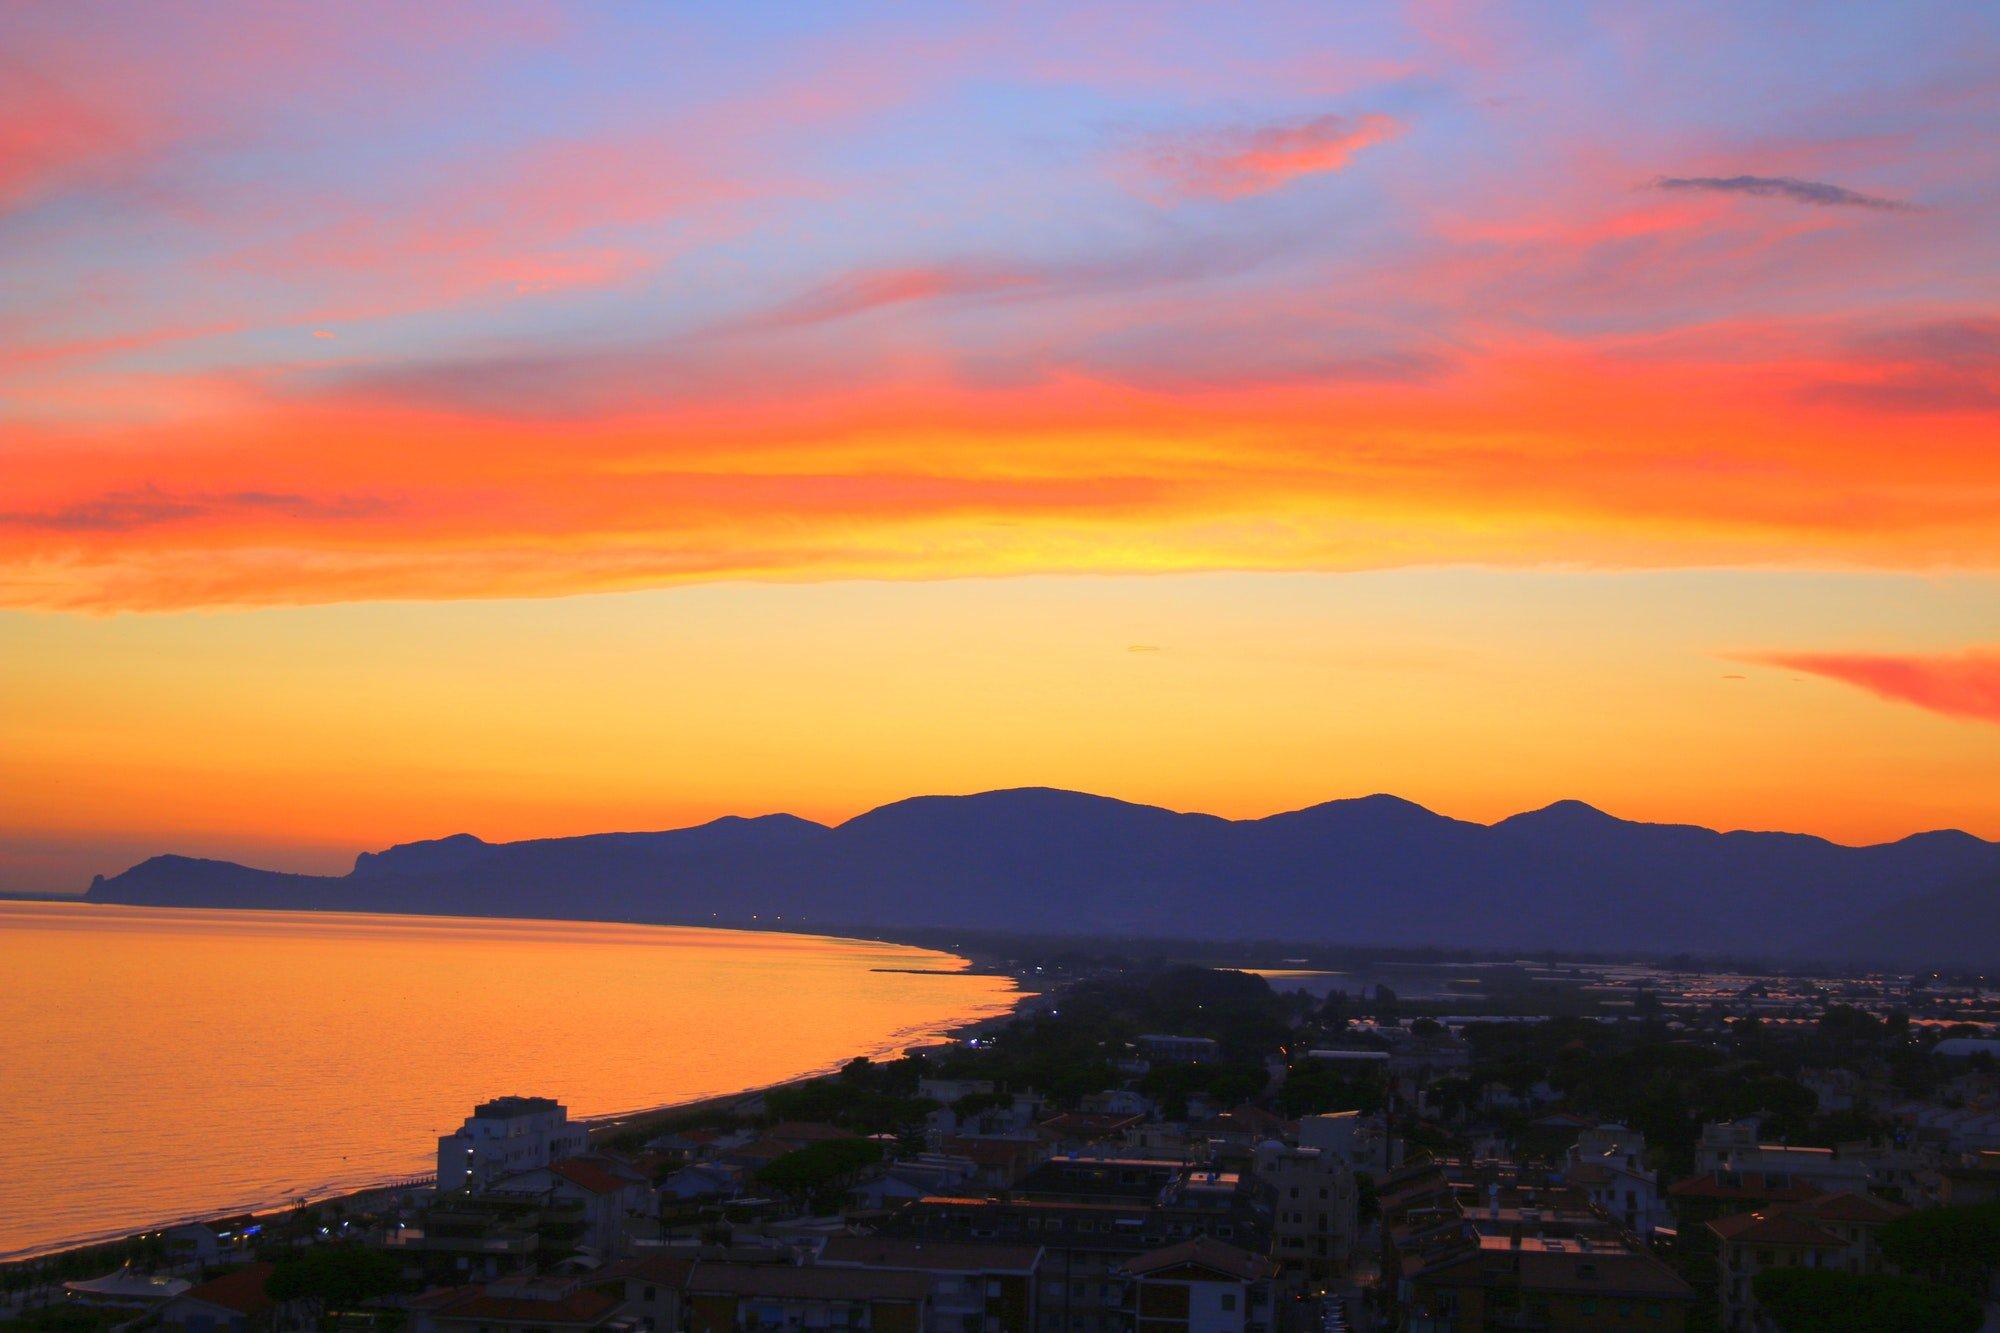 Sunset in Sperlonga, Italy 🇮🇹